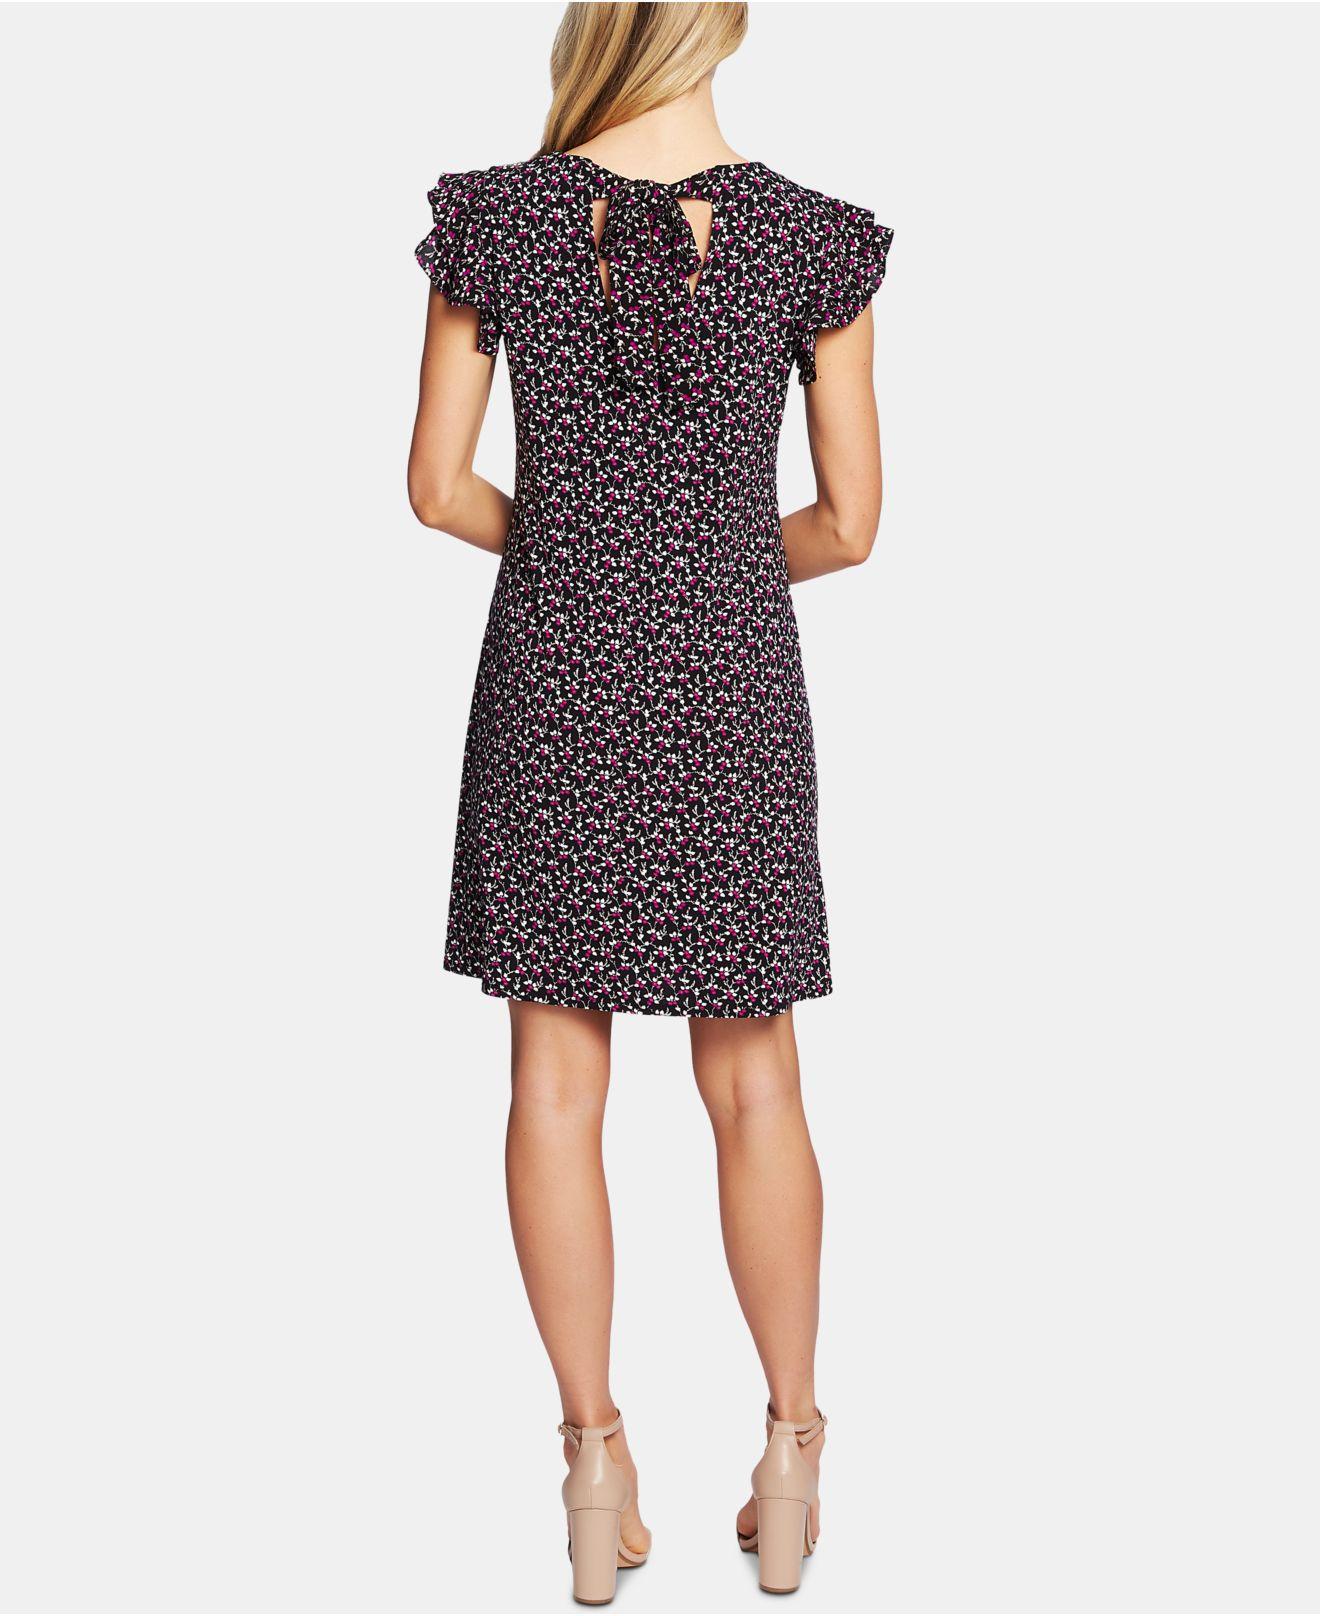 92d431ec3b1f Cece Flutter-sleeve Floral-print Dress in Black - Lyst